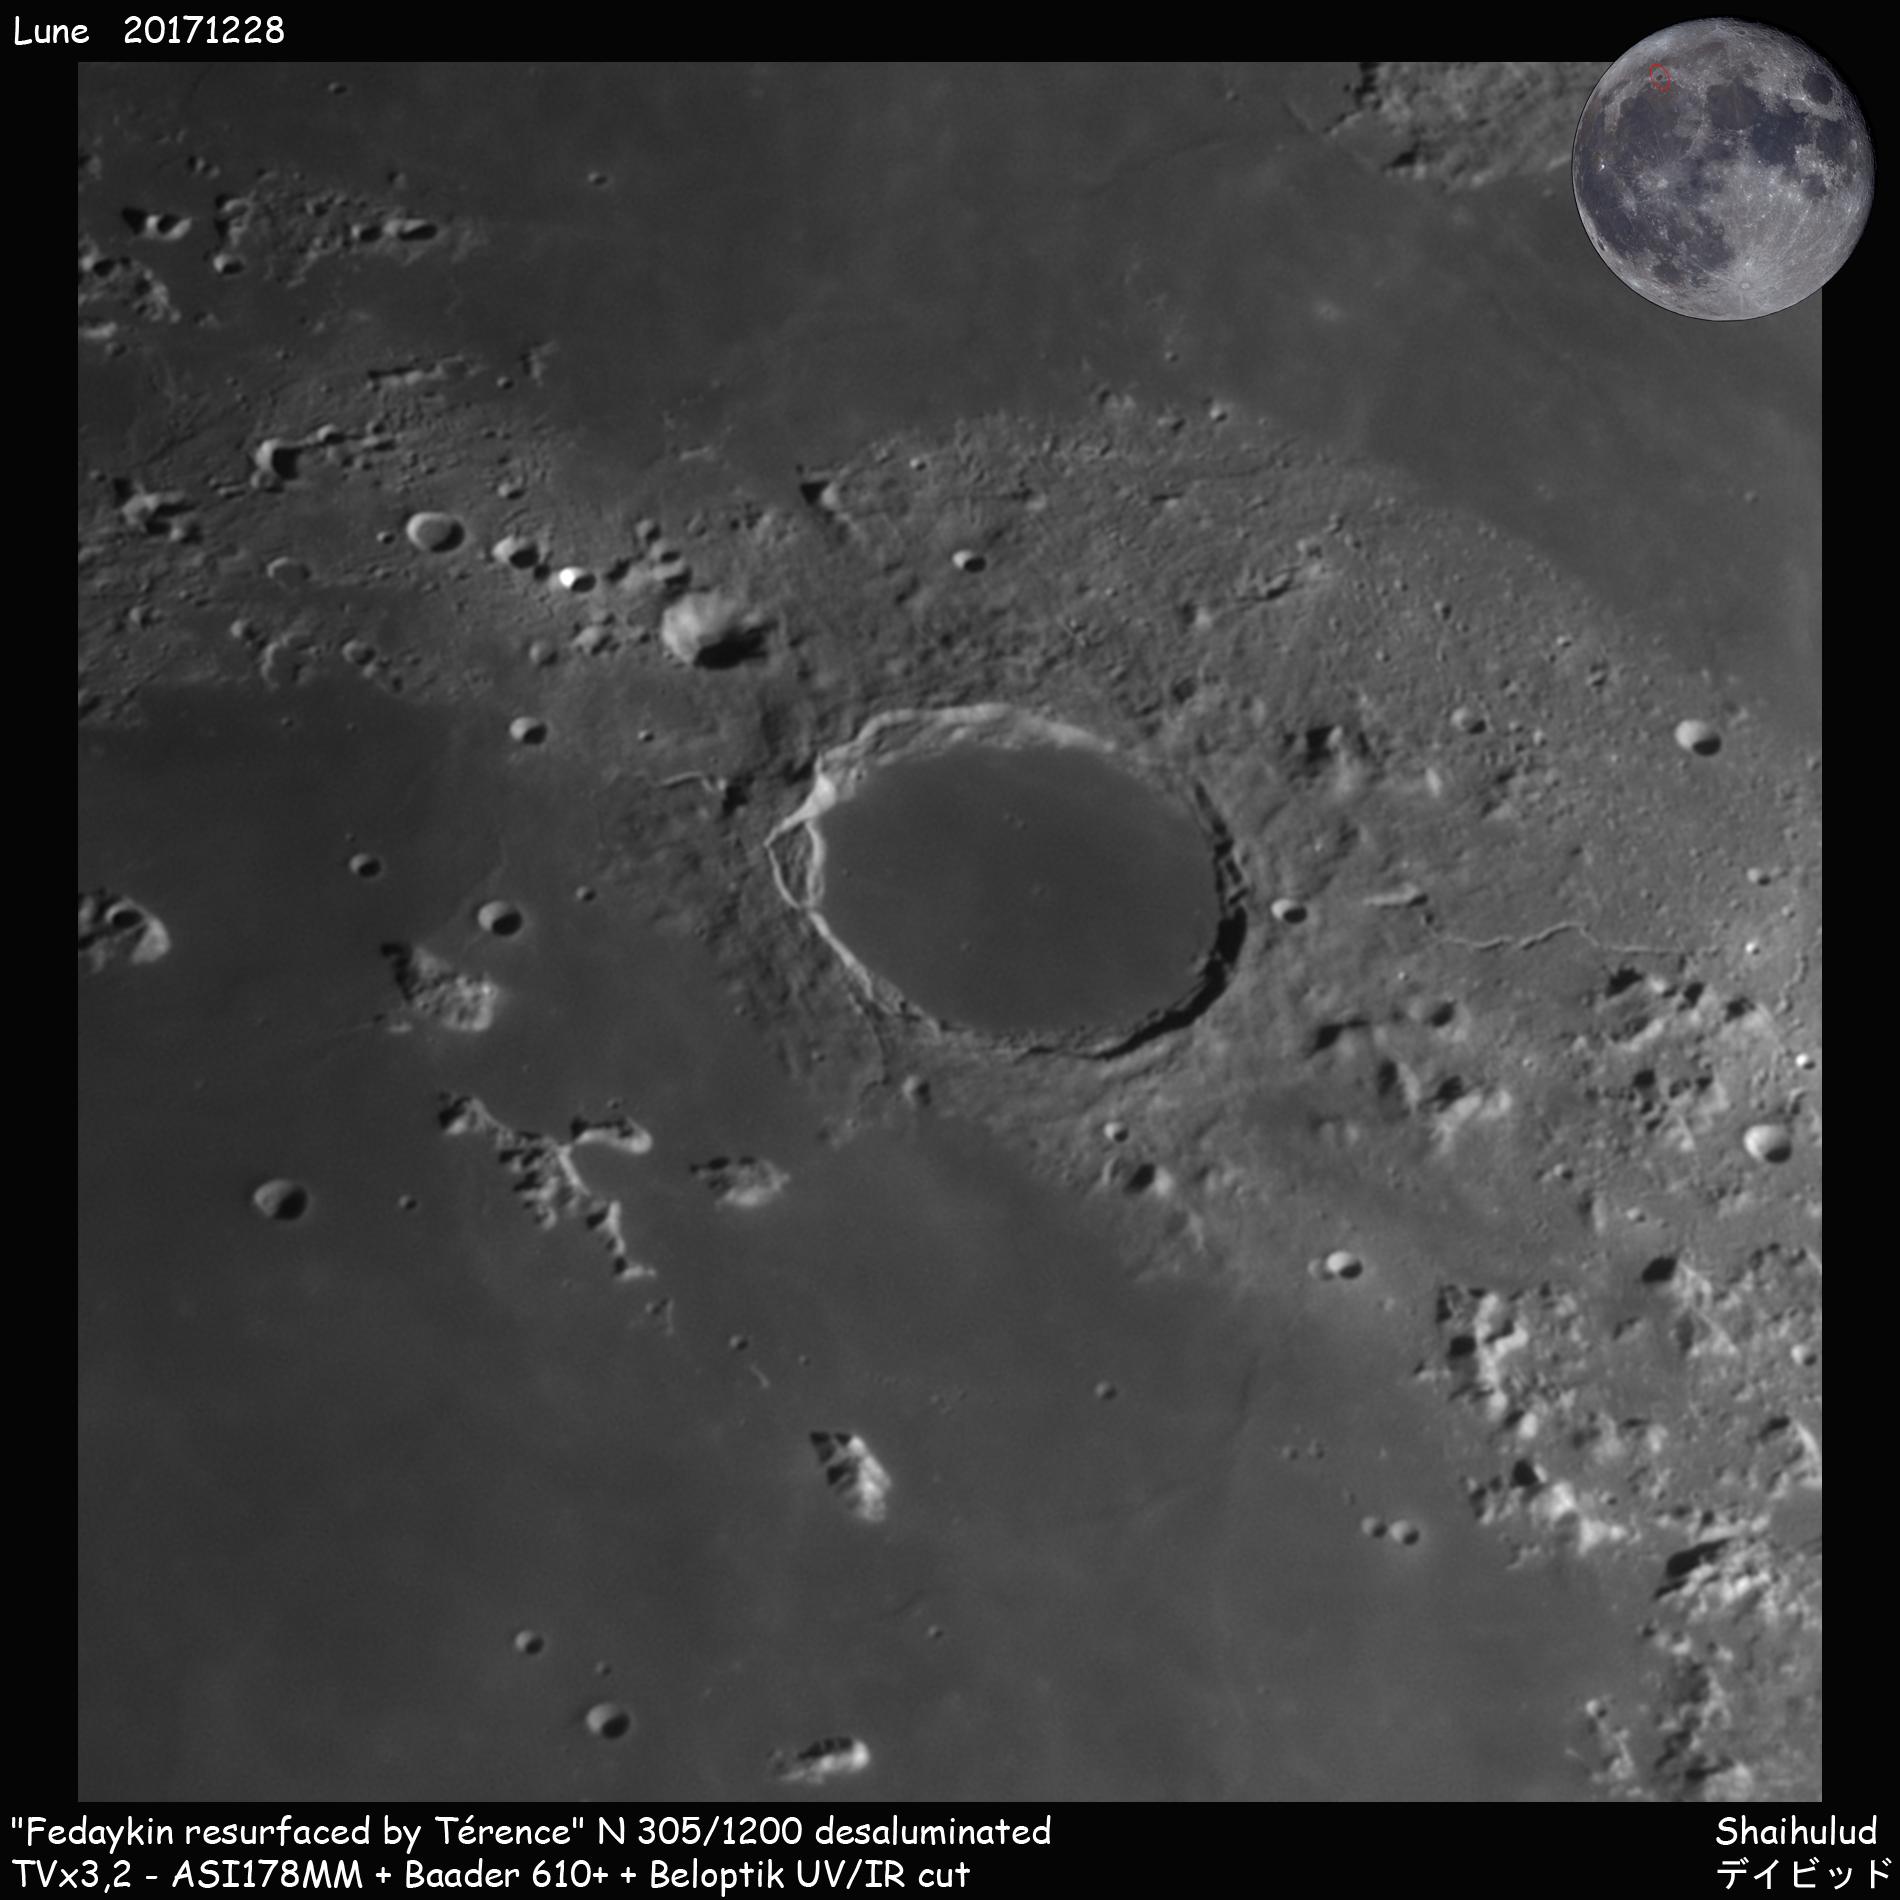 Lune 20171228 (1/5)